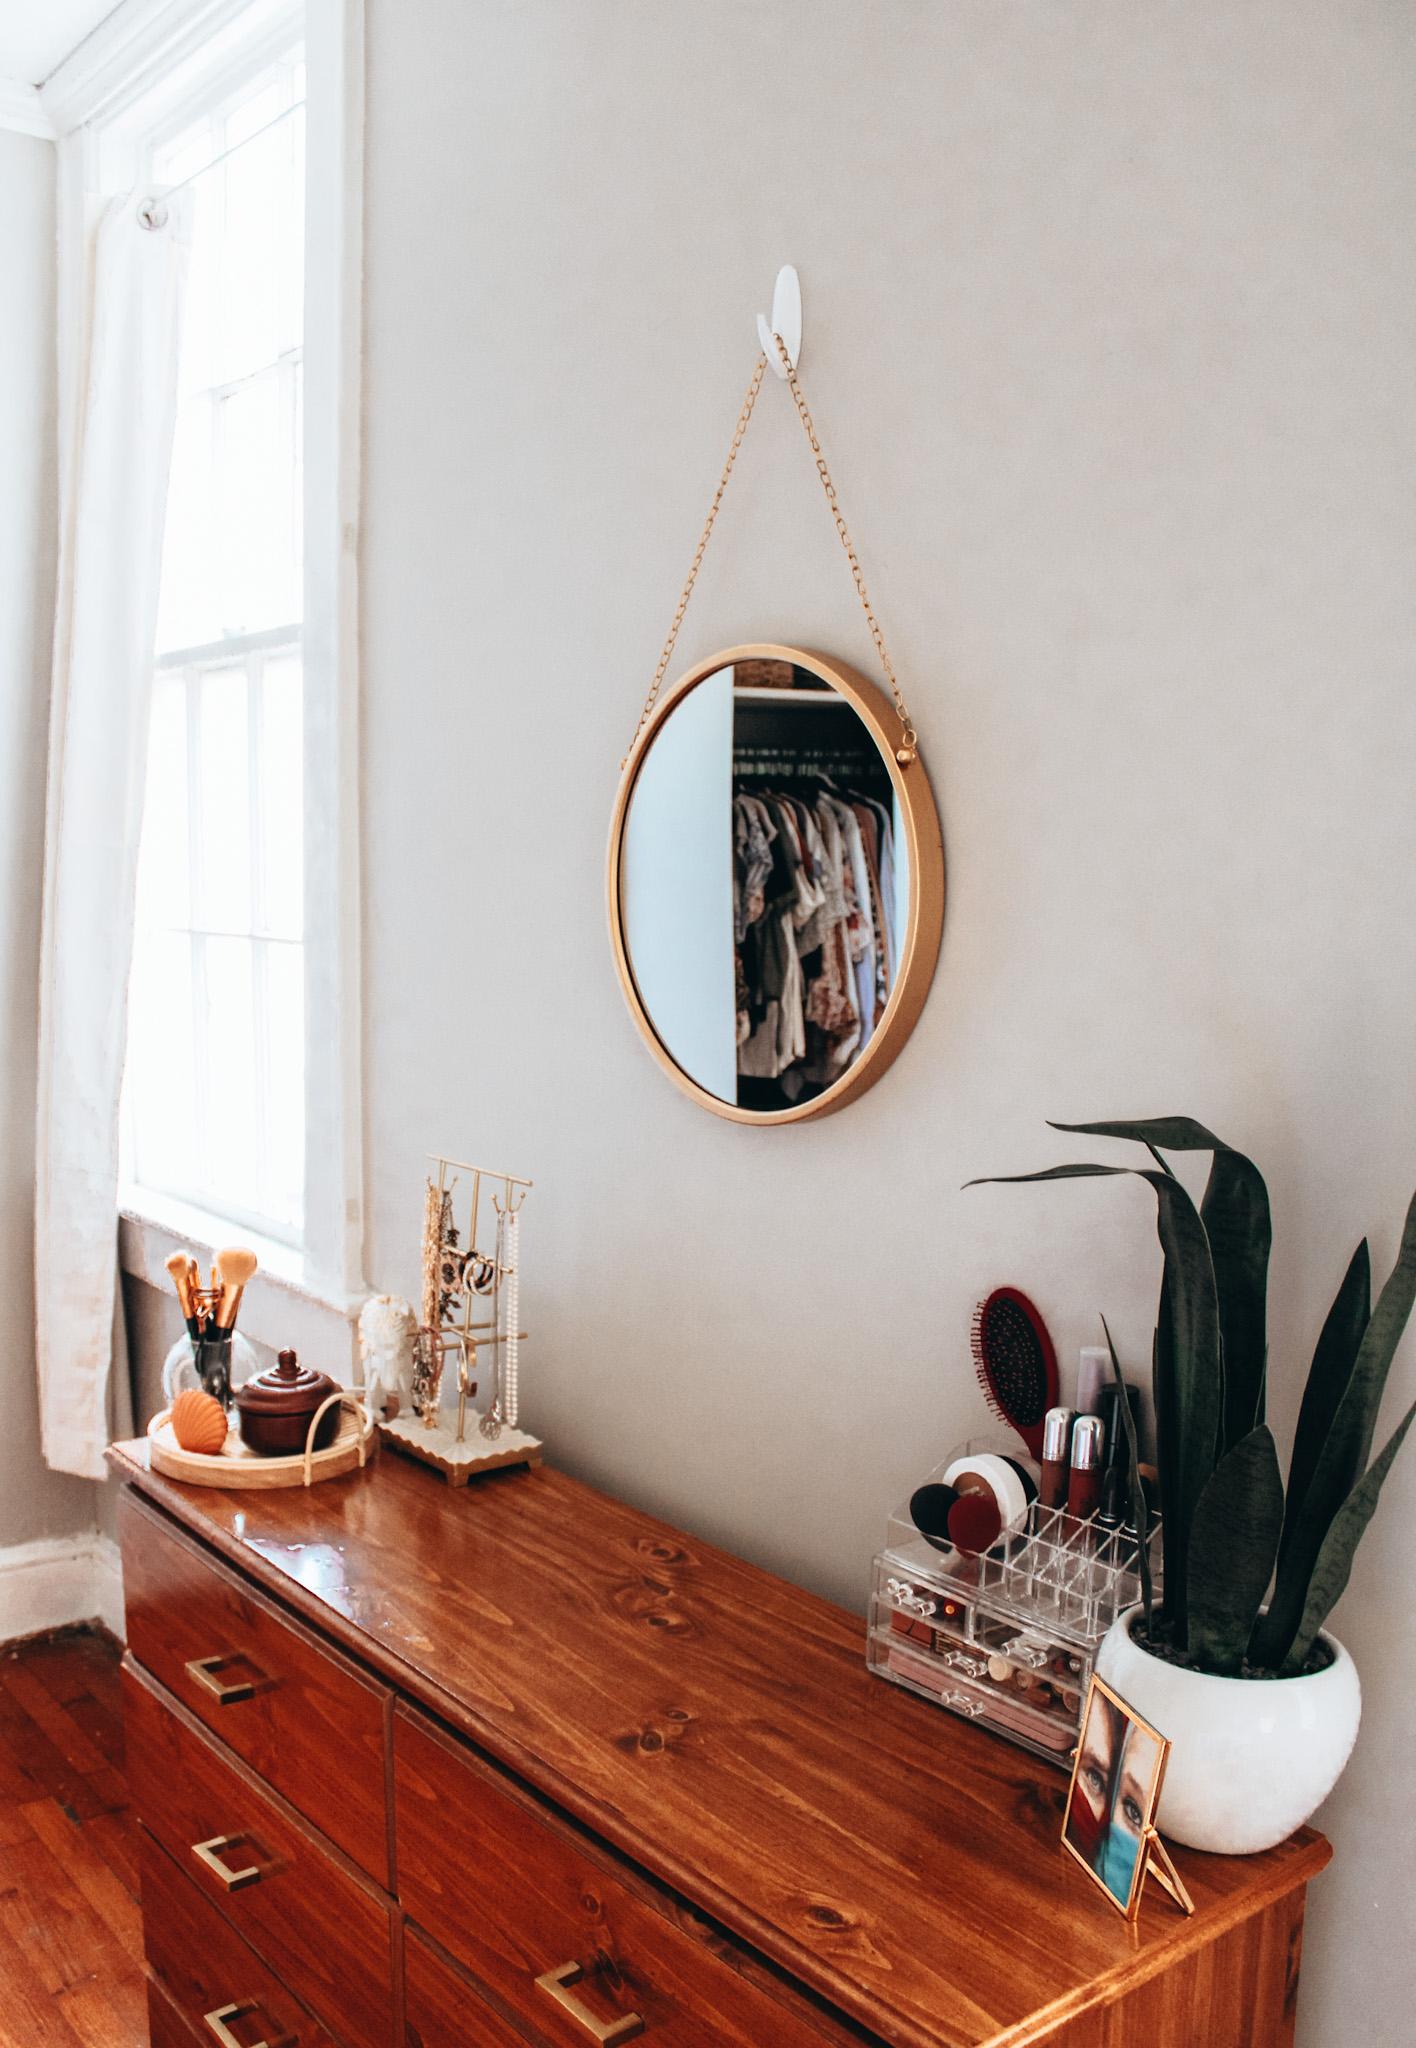 Apartment decor ideas